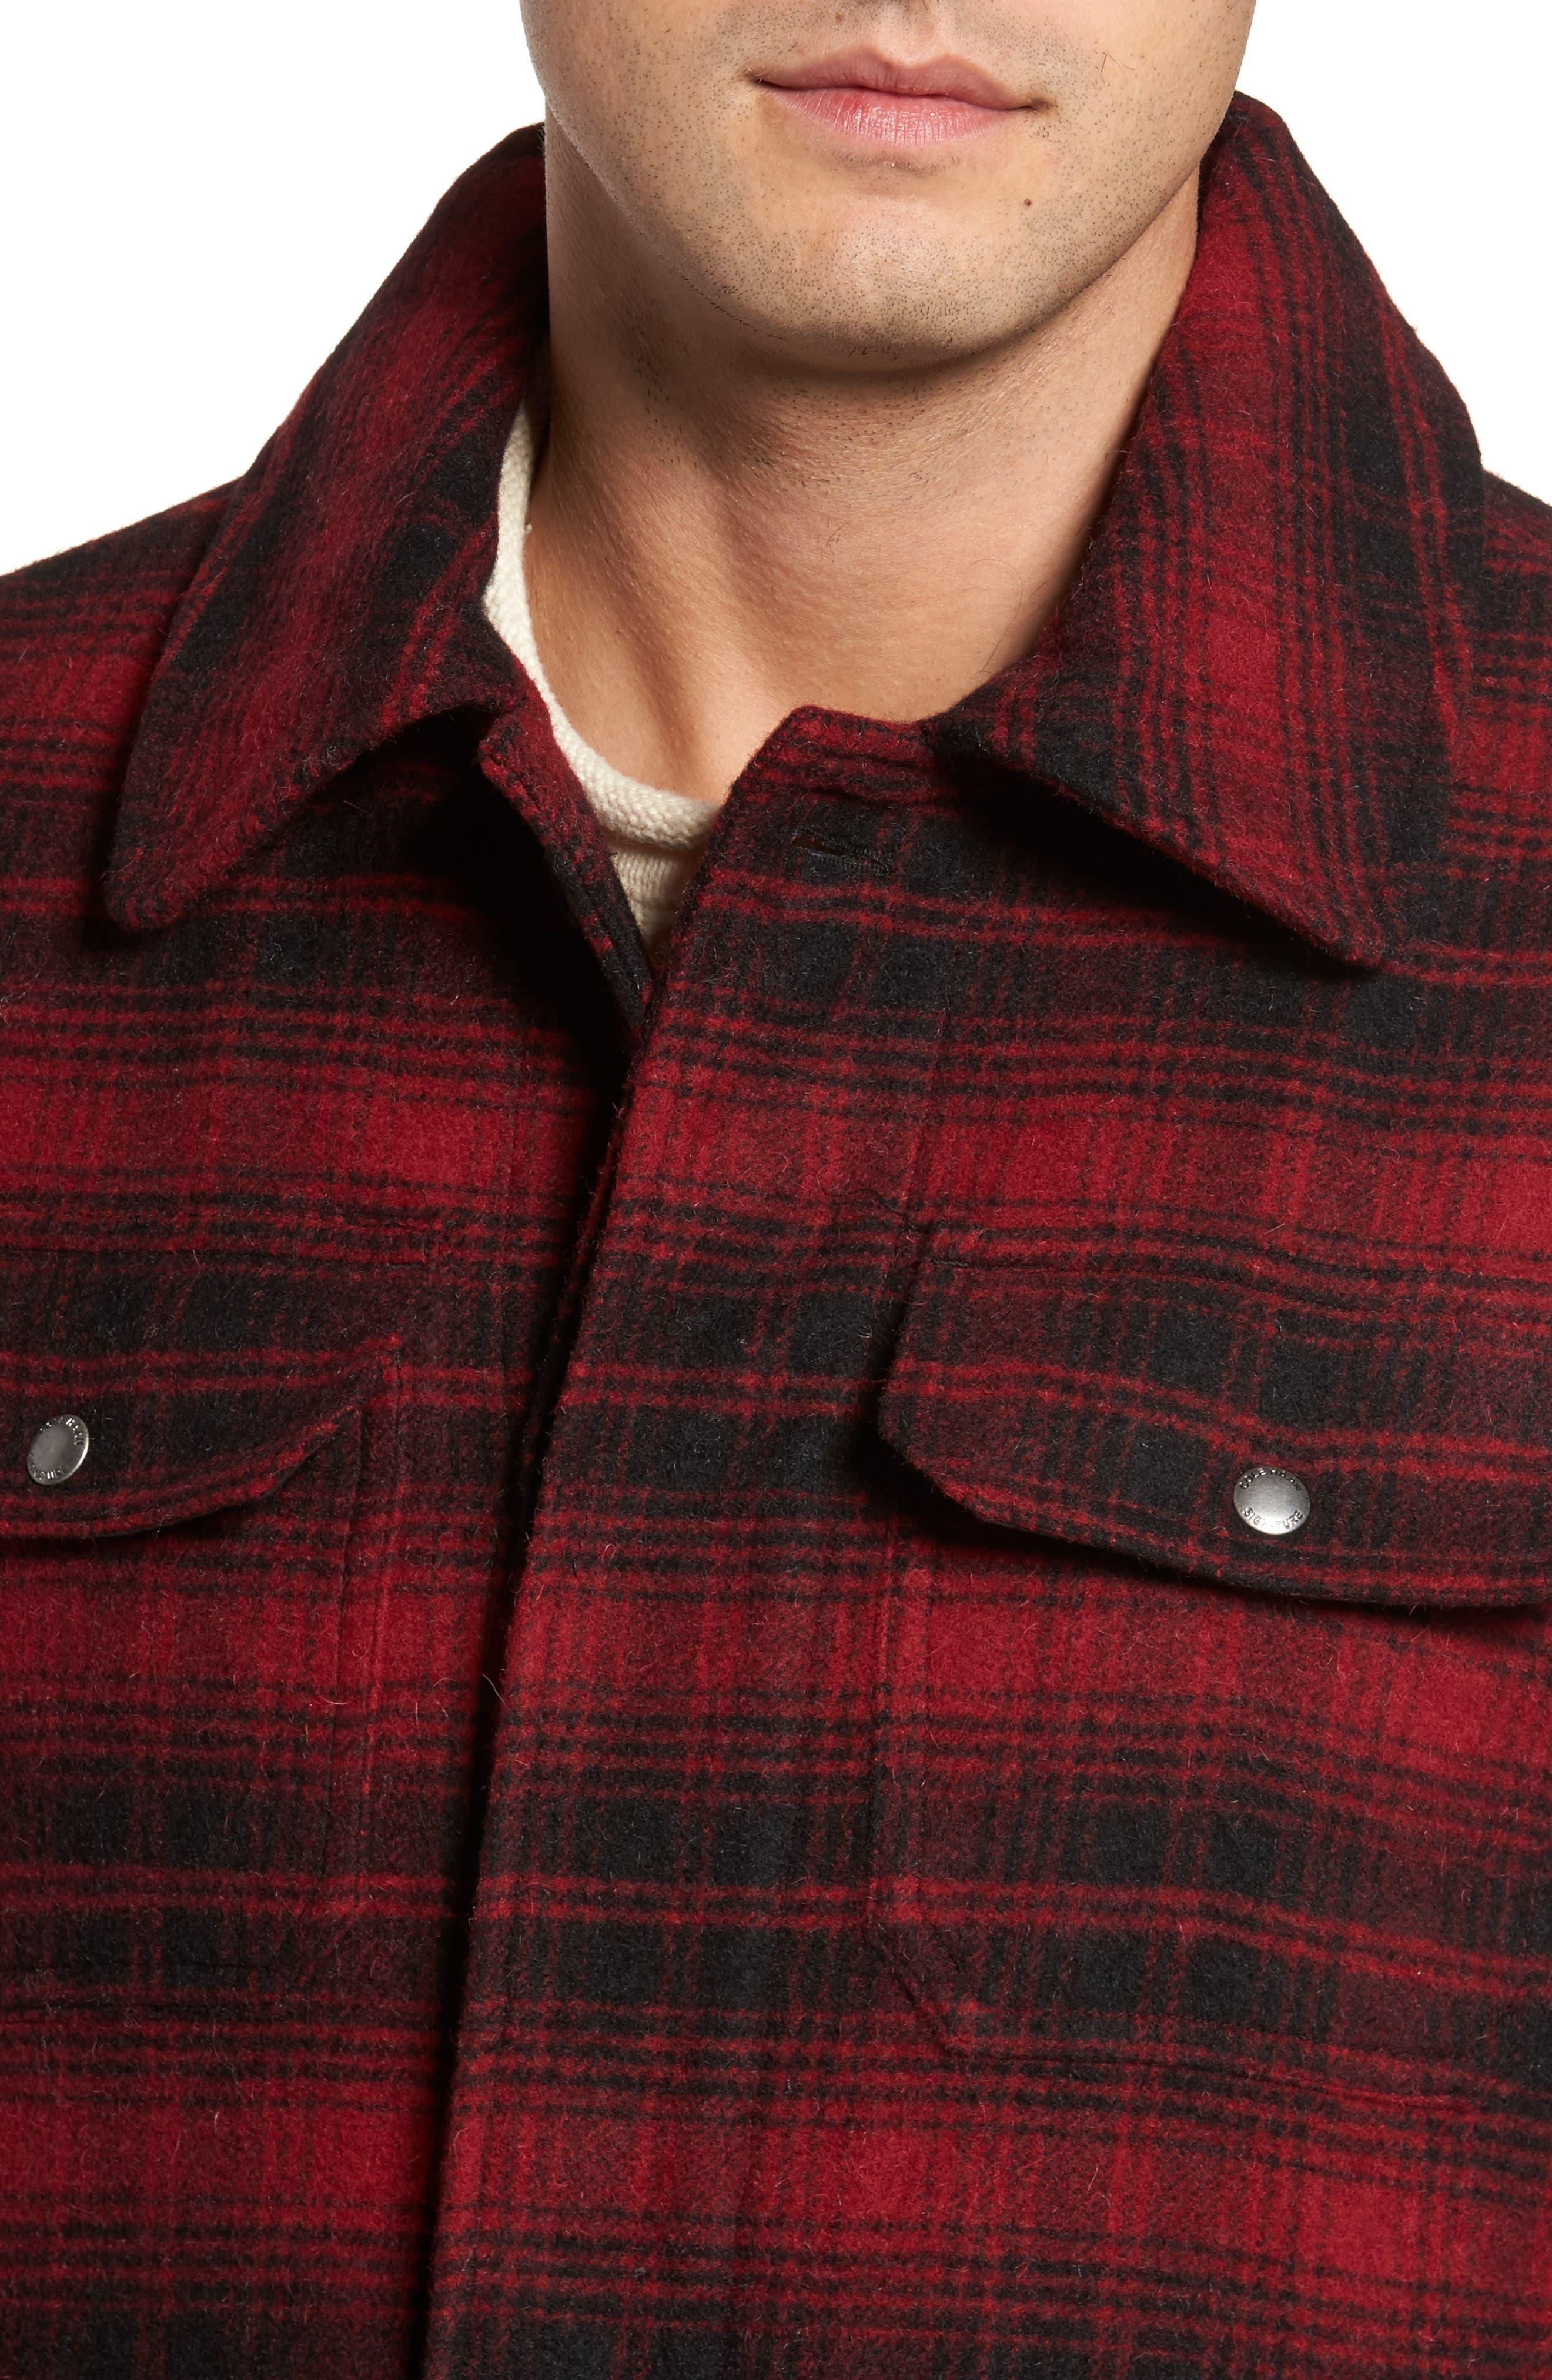 Hunter Jack Wool Blend Shirt Jacket,                             Alternate thumbnail 4, color,                             618